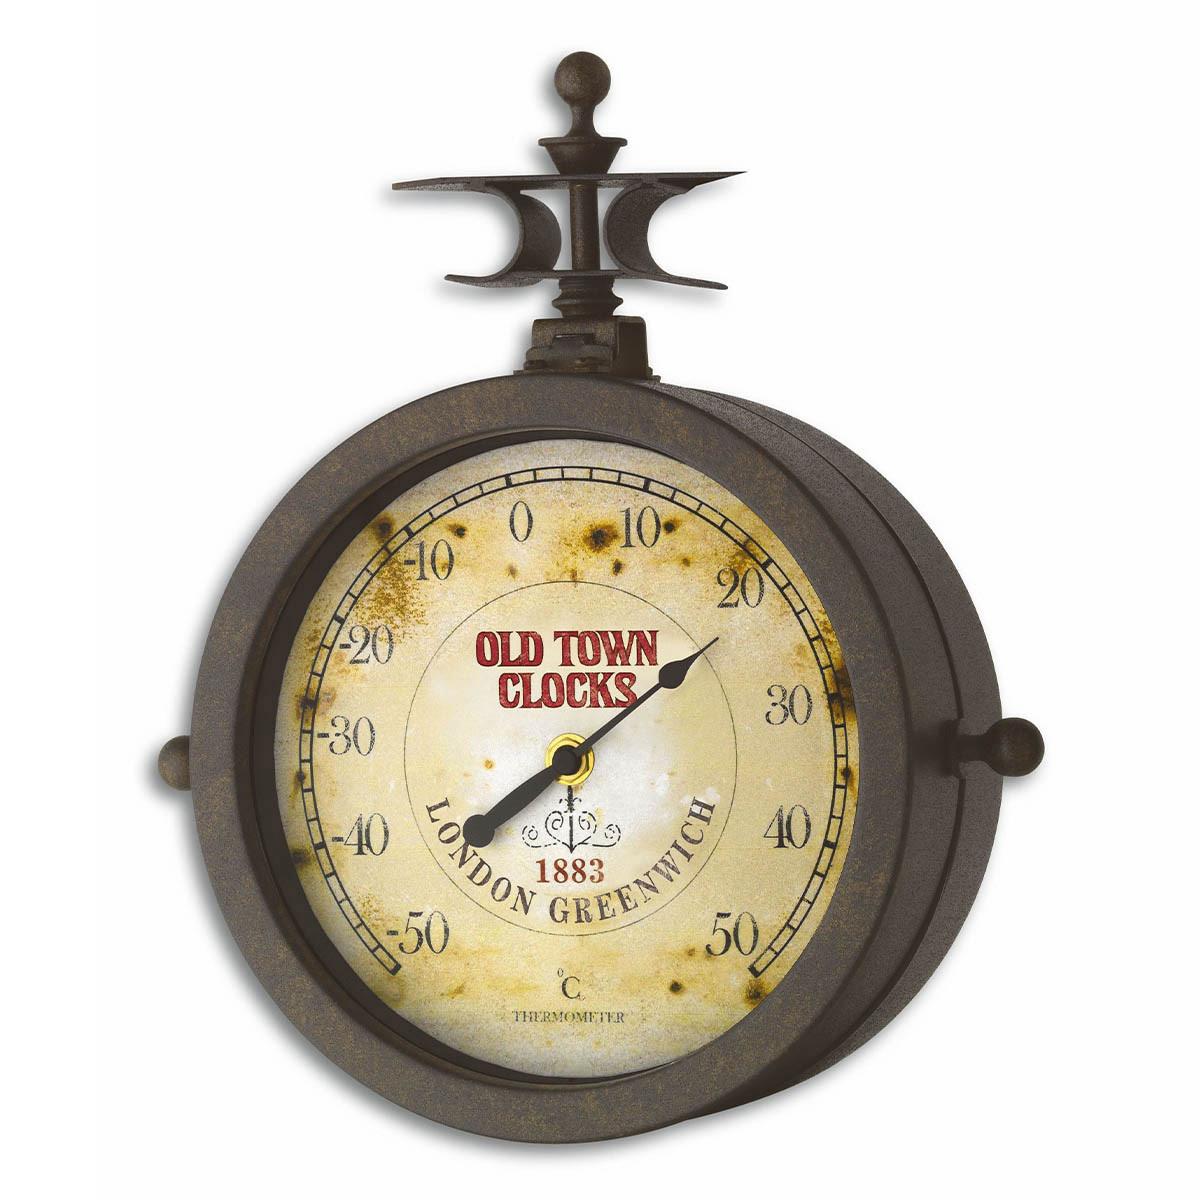 60-3011-wanduhr-thermometer-nostalgie-1200x1200px.jpg